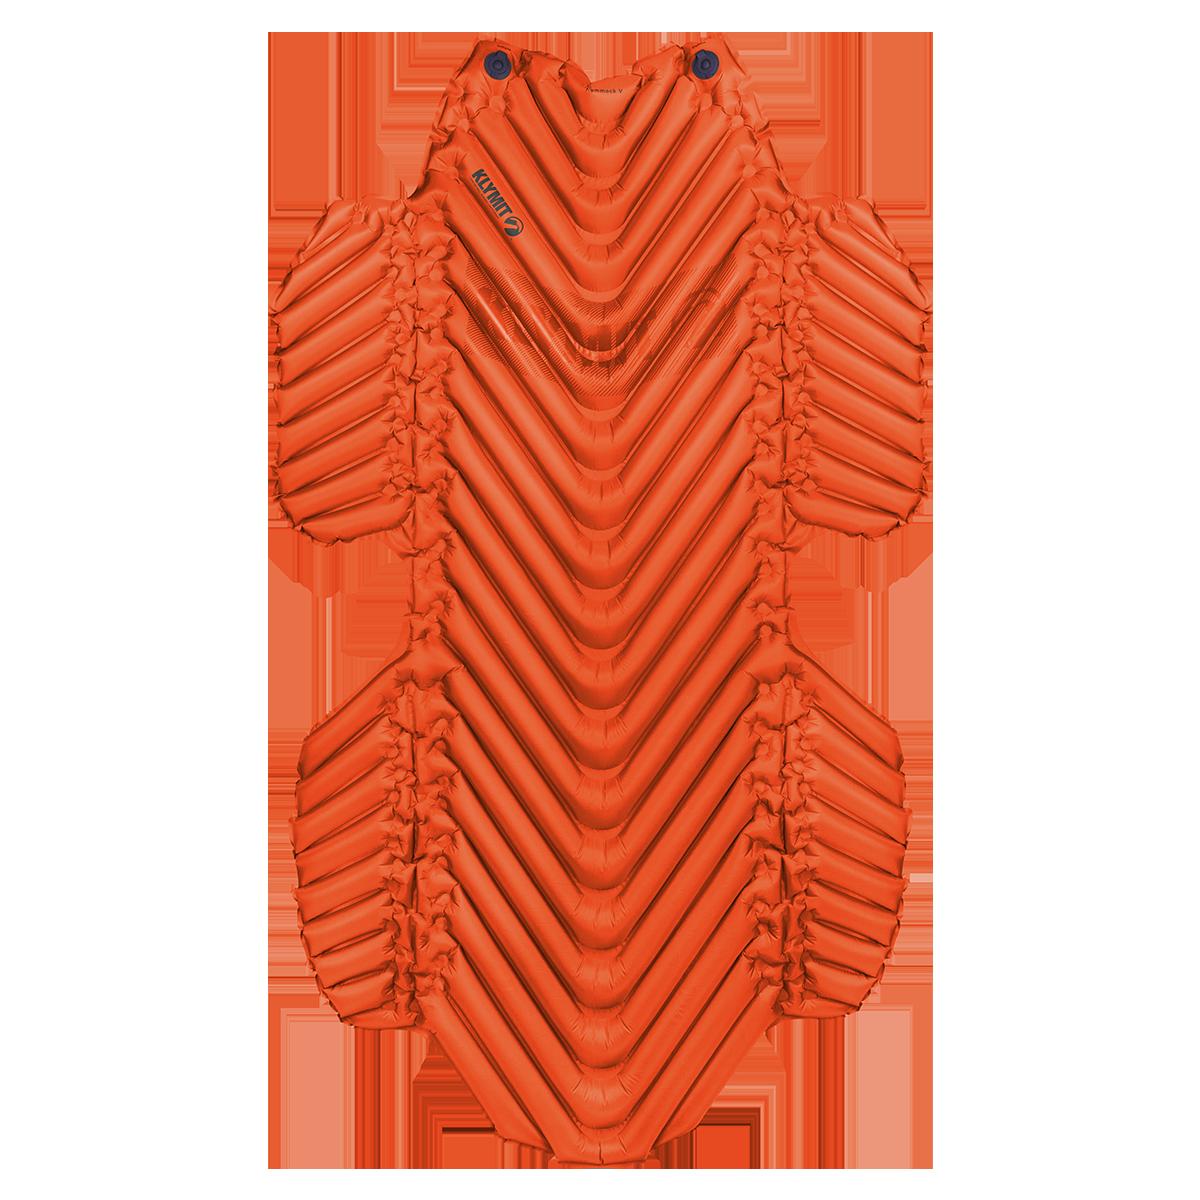 Cover Klymit Insulated Hammock V 32 Oz Kg X 119 Cm 198 R Value Breaths 25 Polyester Limited Lifetime Warranty